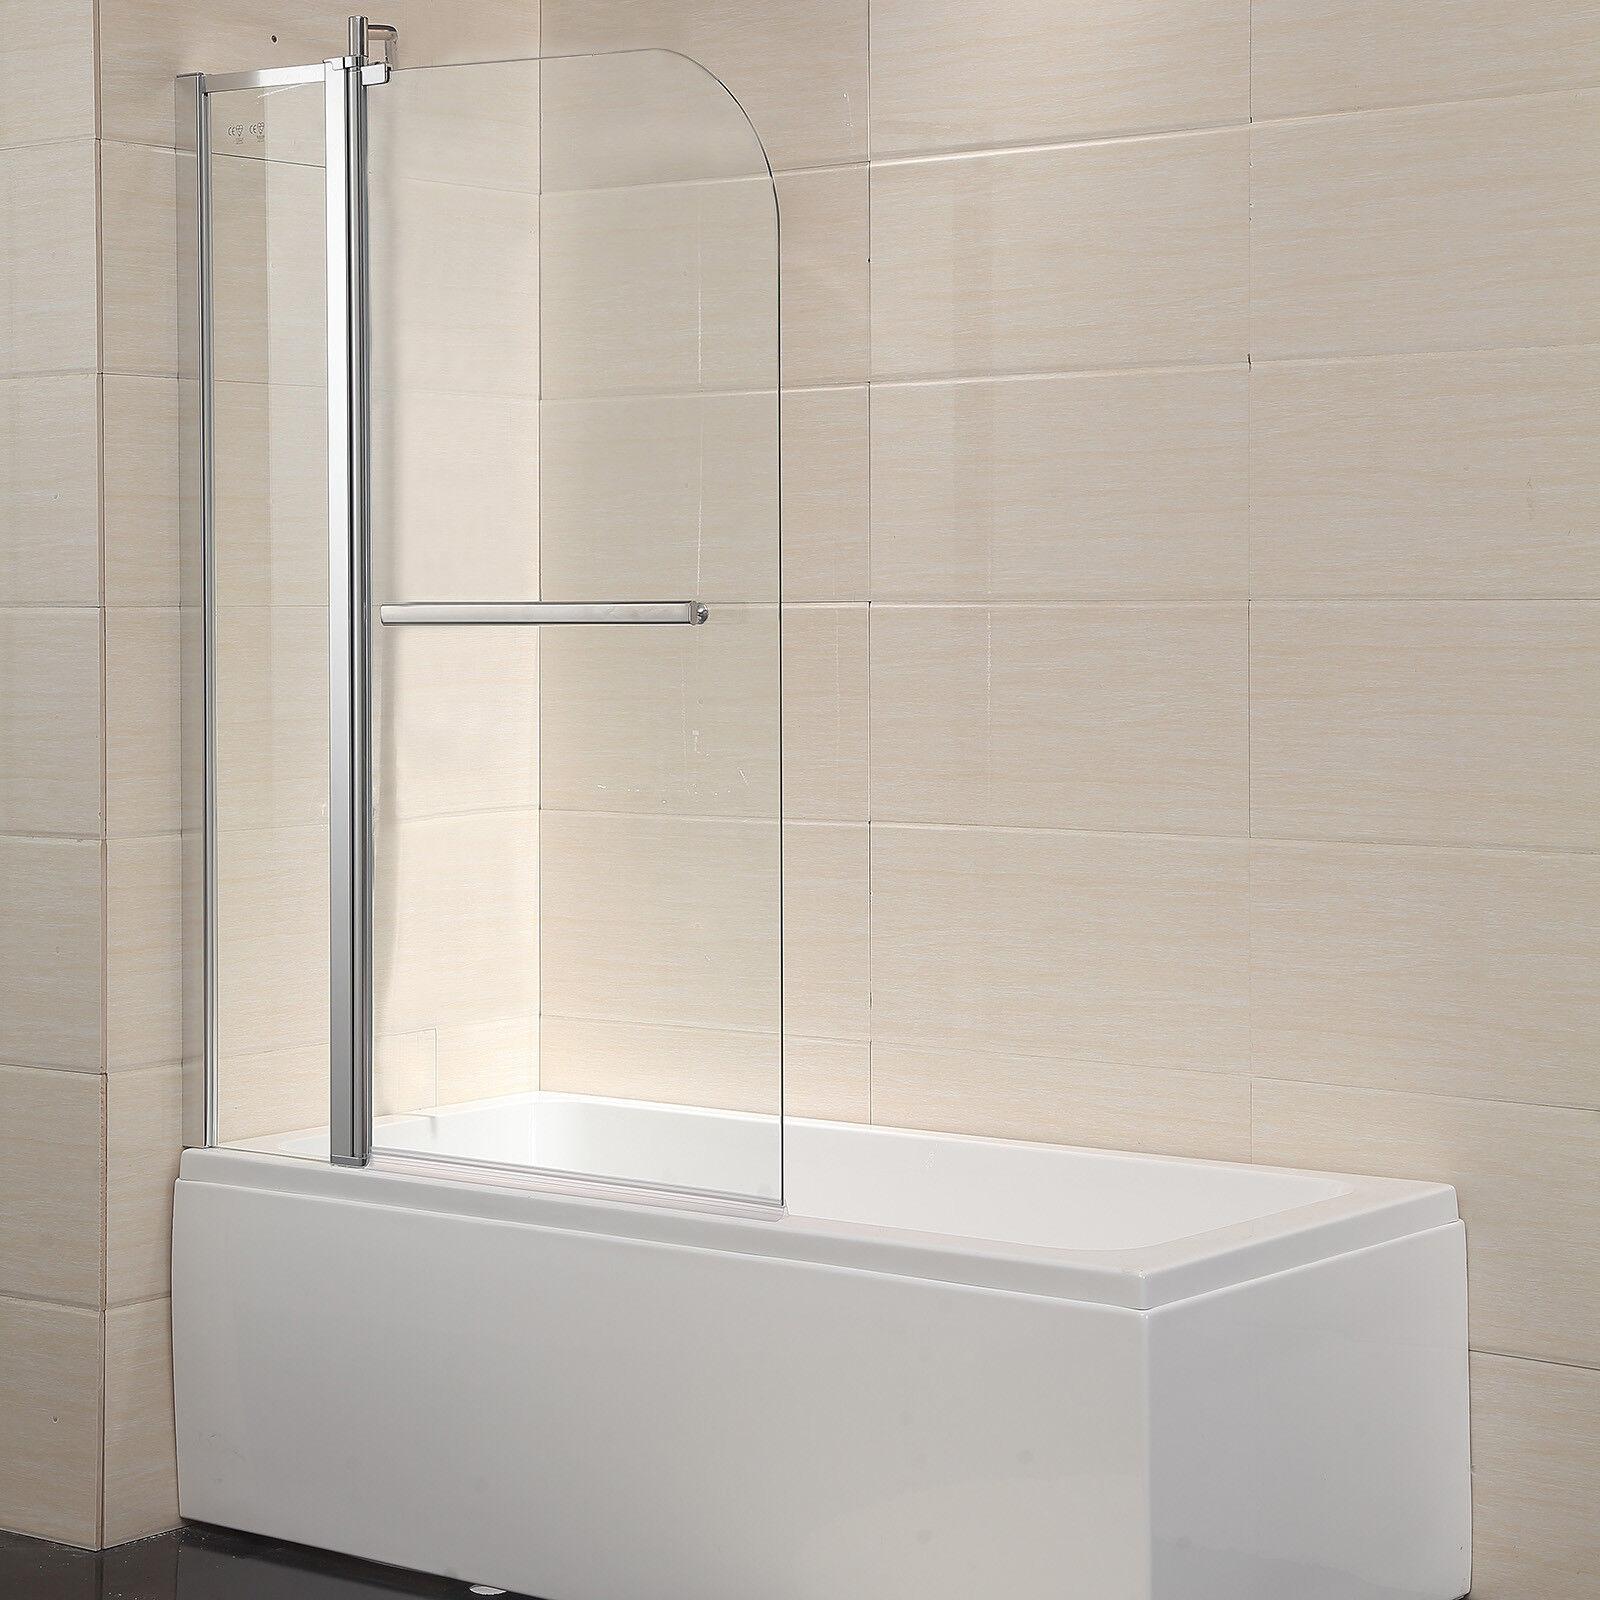 Details About Modern 55 X39 Bath Tub Shower Door 1 4 Clear Glass Pivot Radius Framed Chrome